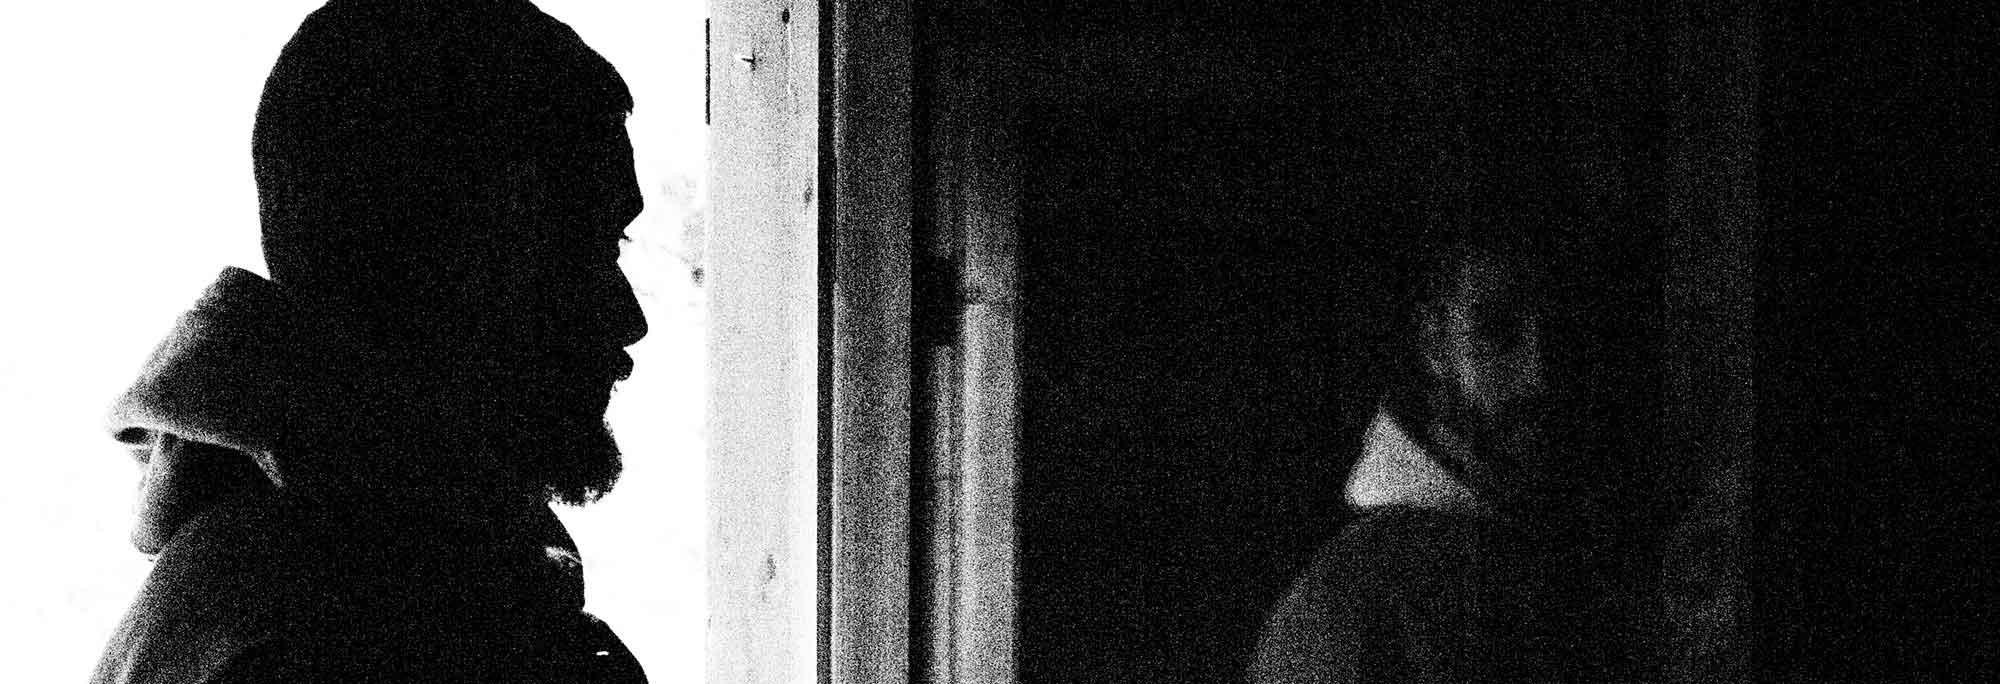 Allan Rayman - Communion